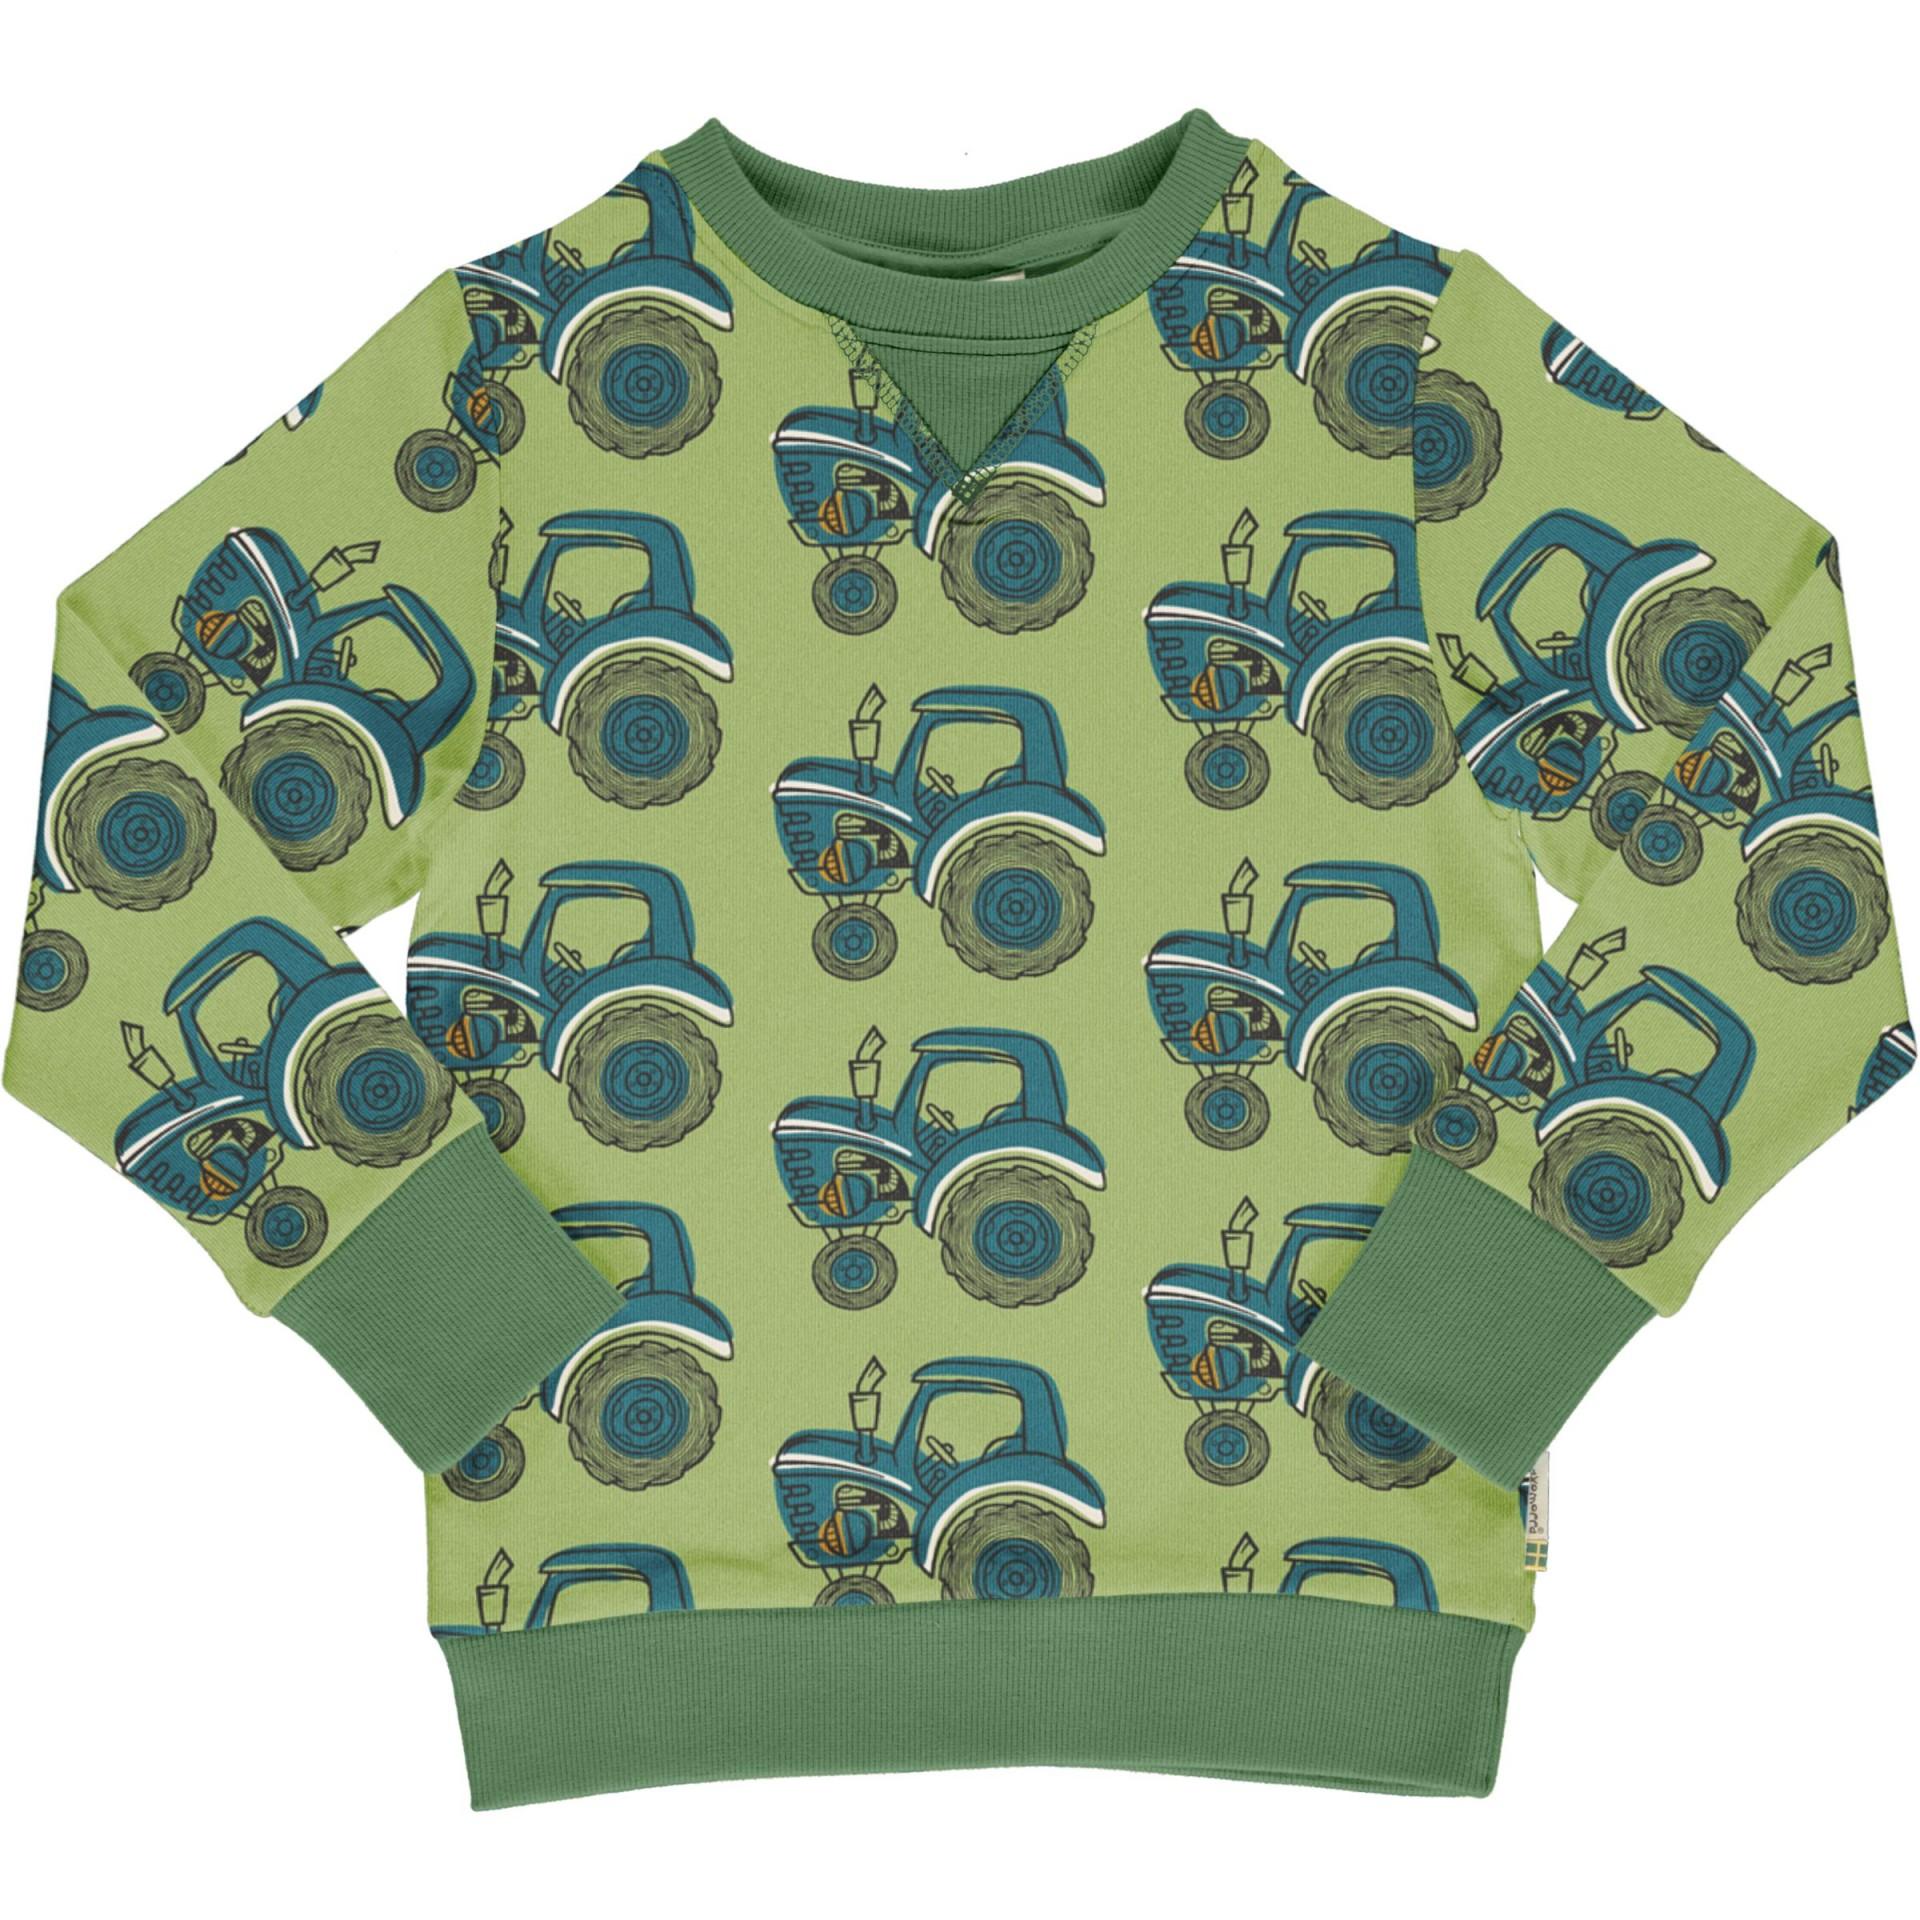 Camisola Sweatshirt TRACTOR Maxomorra (Tamanhos disponíveis 9-12m, 18-24m, 3-4a, 5-6a)